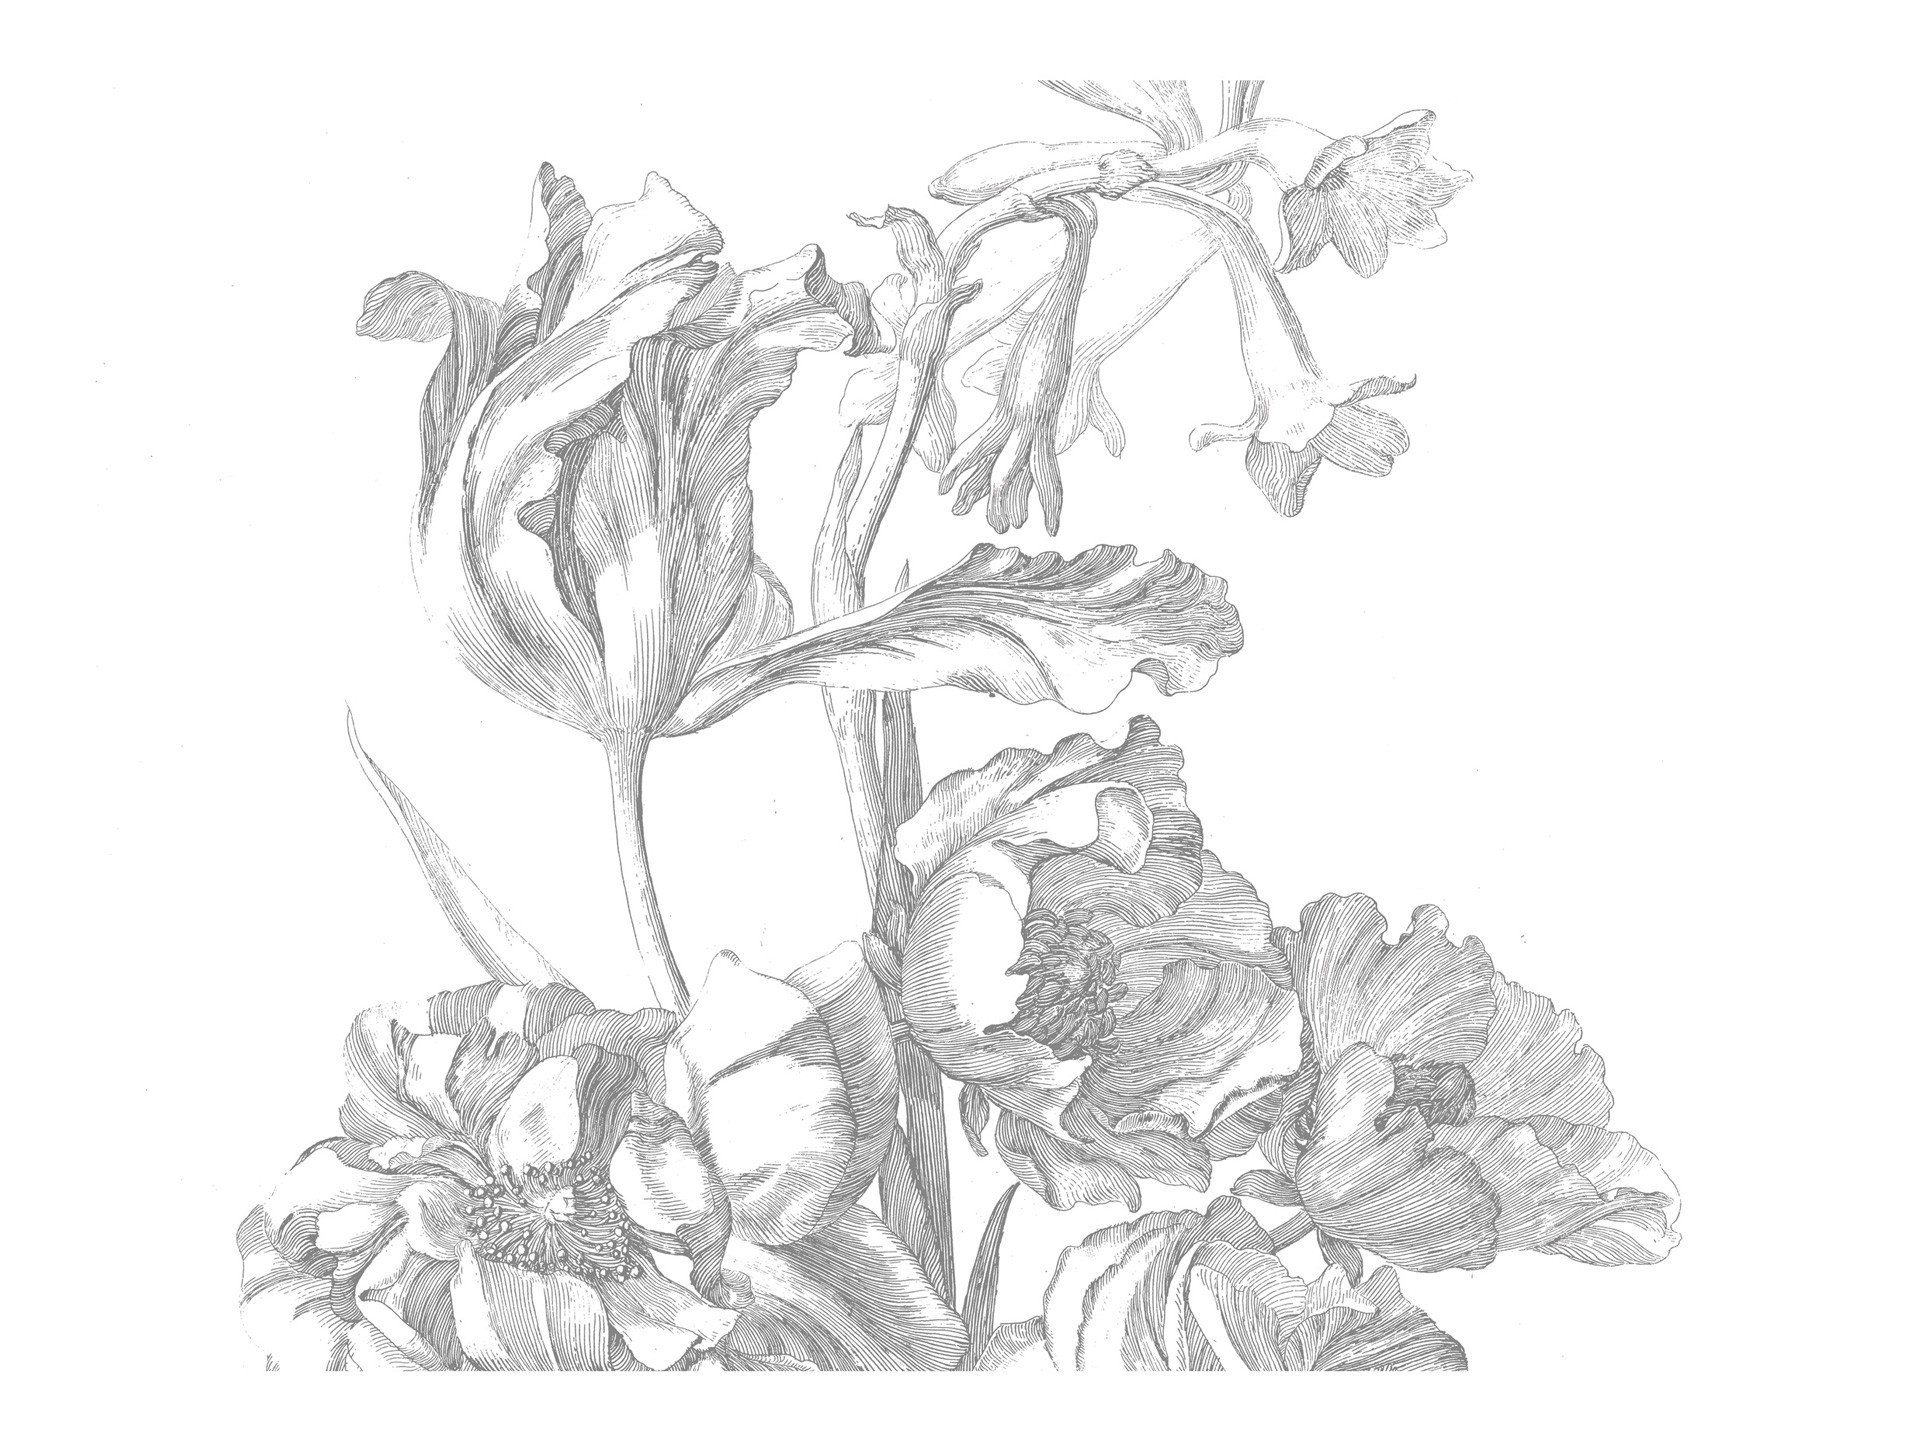 Kek Amsterdam Engraved Flowers I 389.6x280cm-8718754018524-31